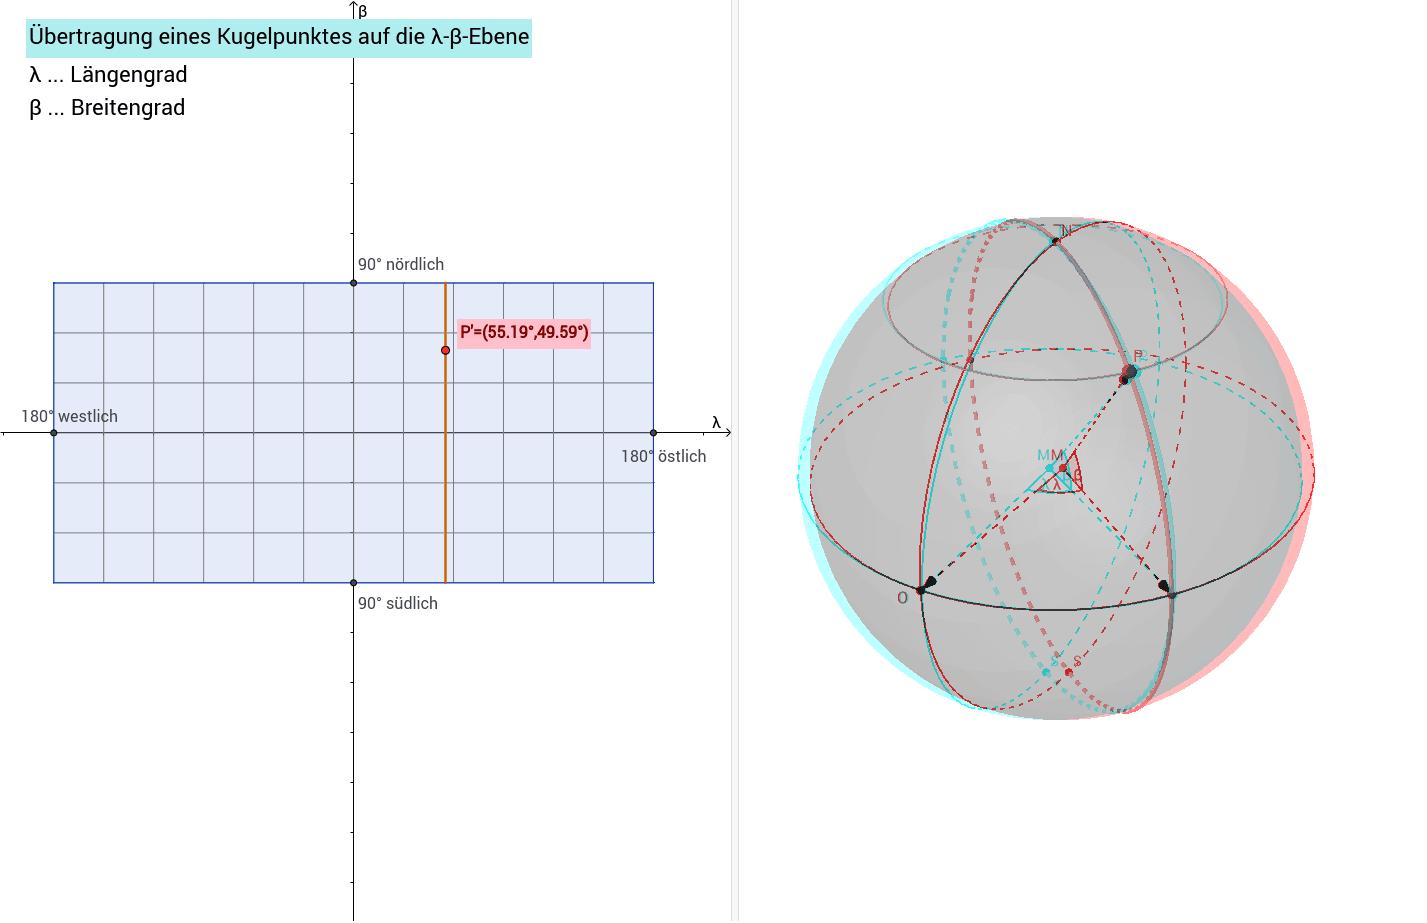 Plattkarte - GeoGebra Dynamisches Arbeitsblatt